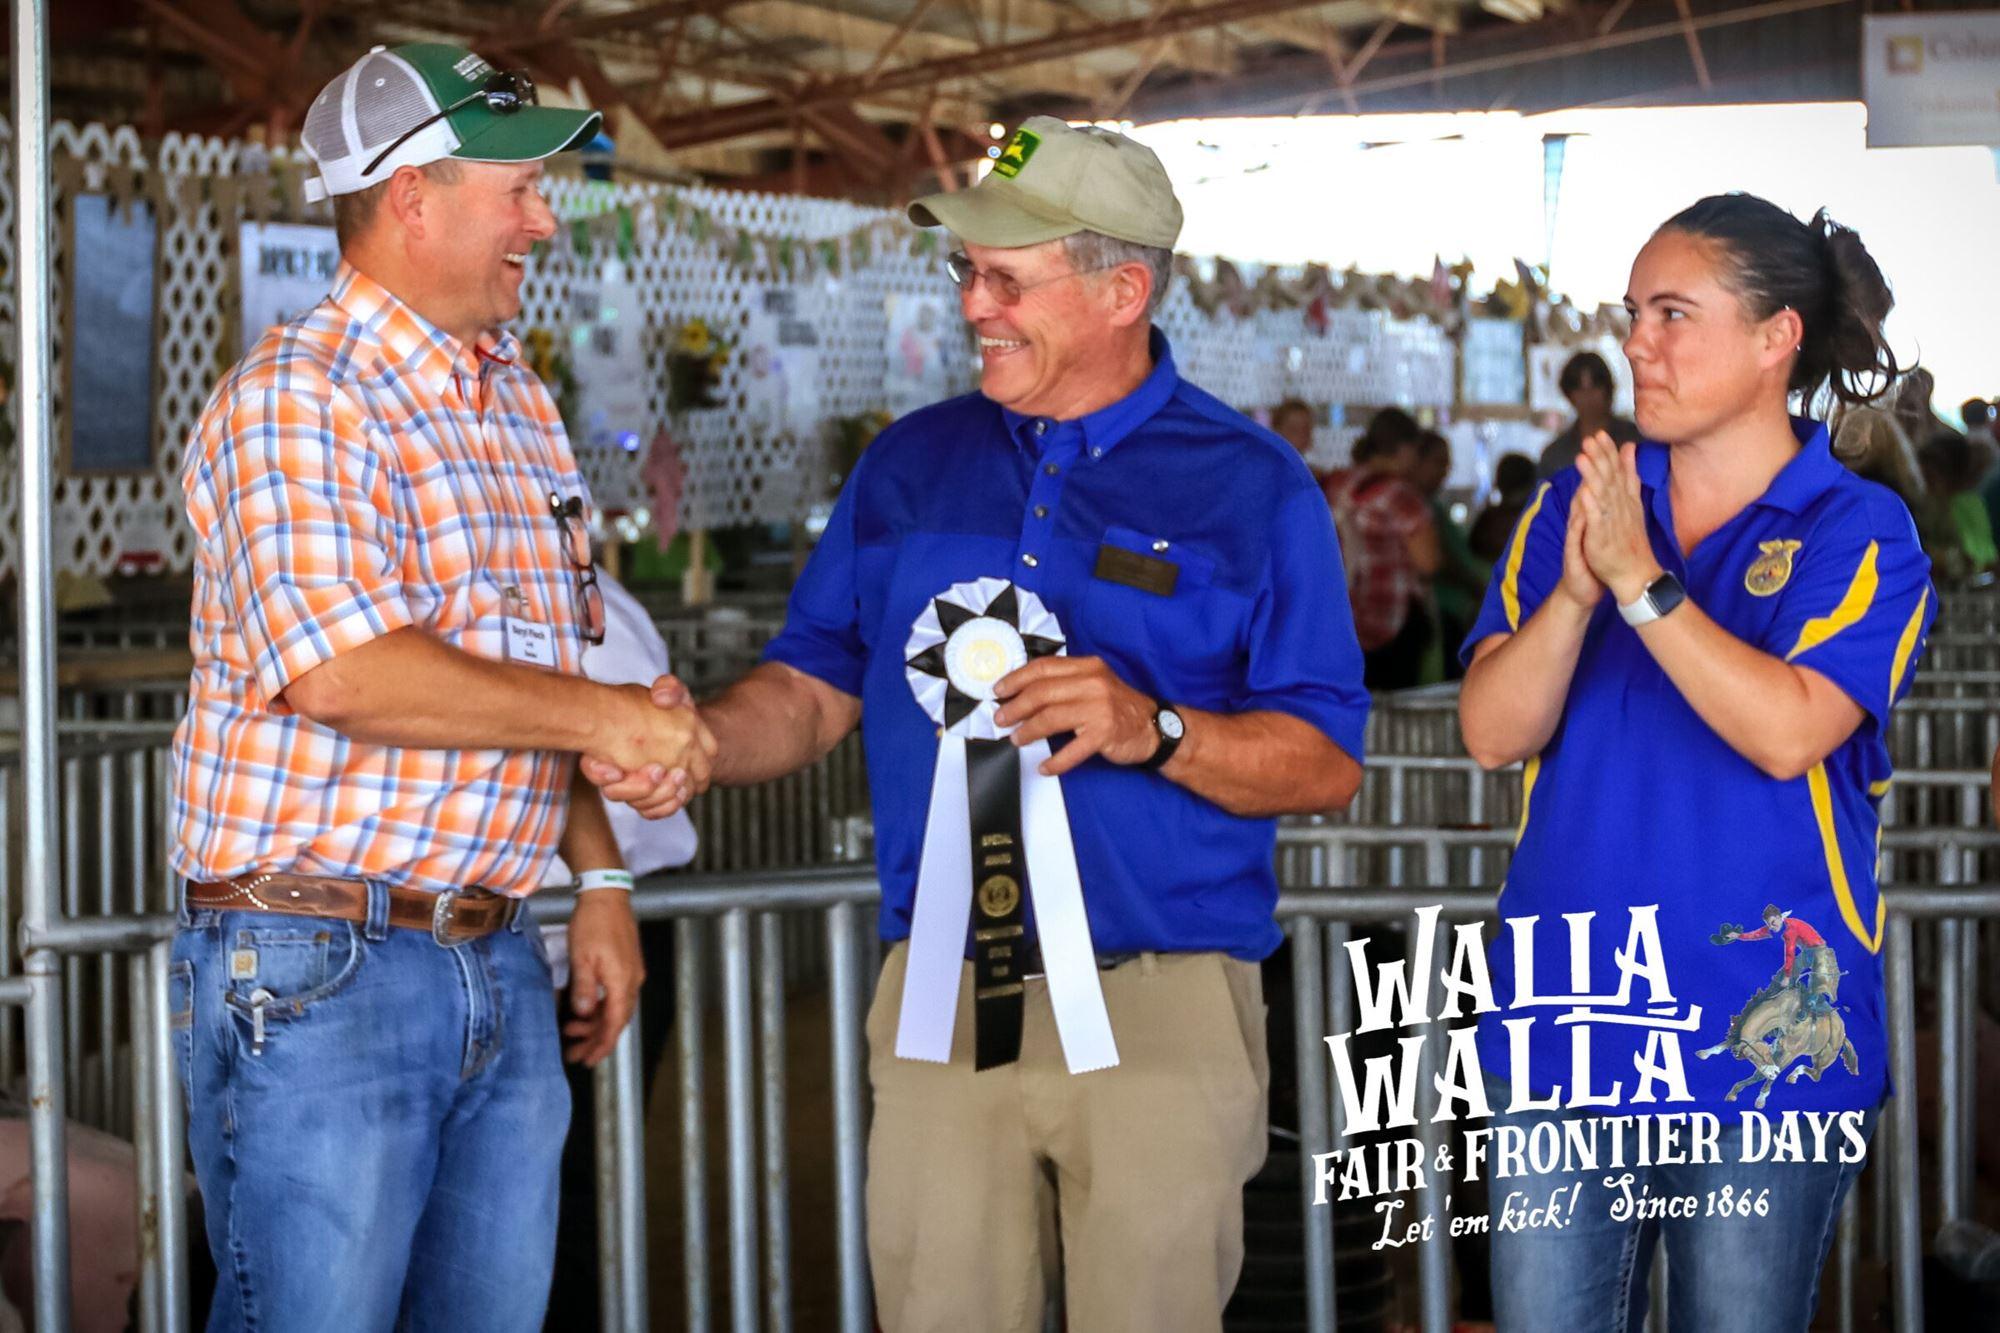 2021 Walla Walla Fair and Frontier Days